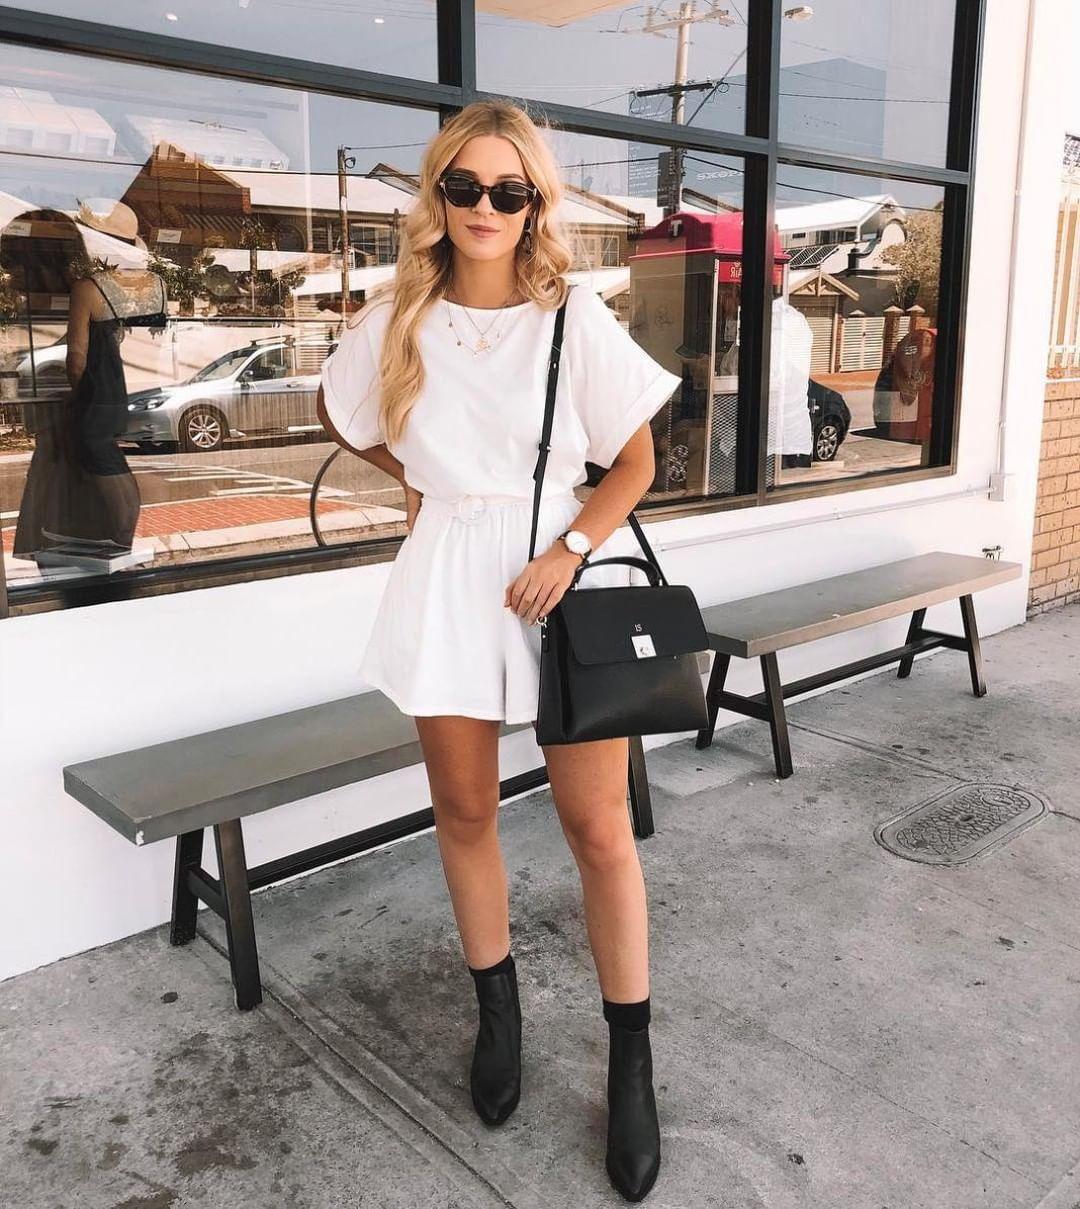 shorts white shorts black boots ankle boots black bag white t-shirt